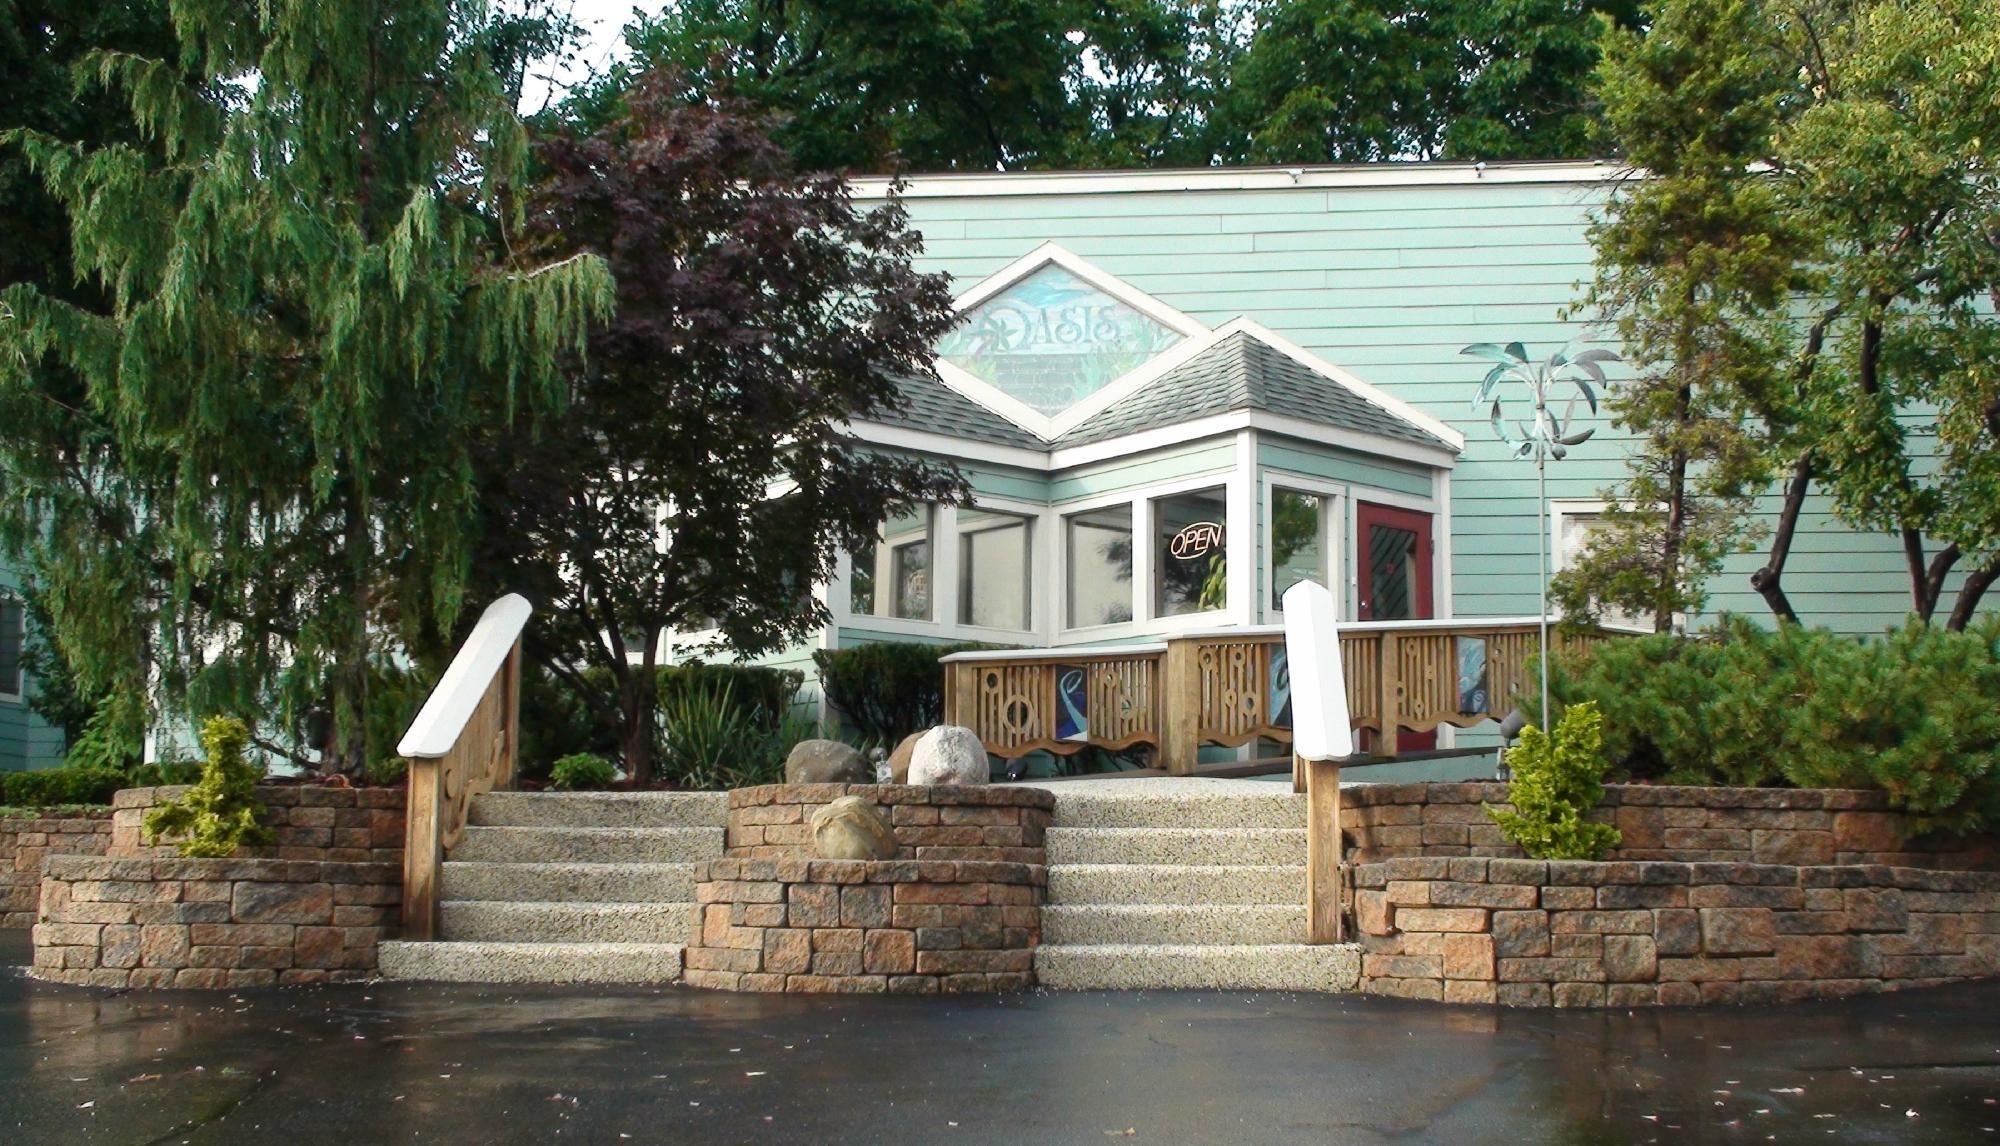 8f51964f2bb1c7172e1853db77b219f2 - Oasis Hot Tub Gardens In Ann Arbor